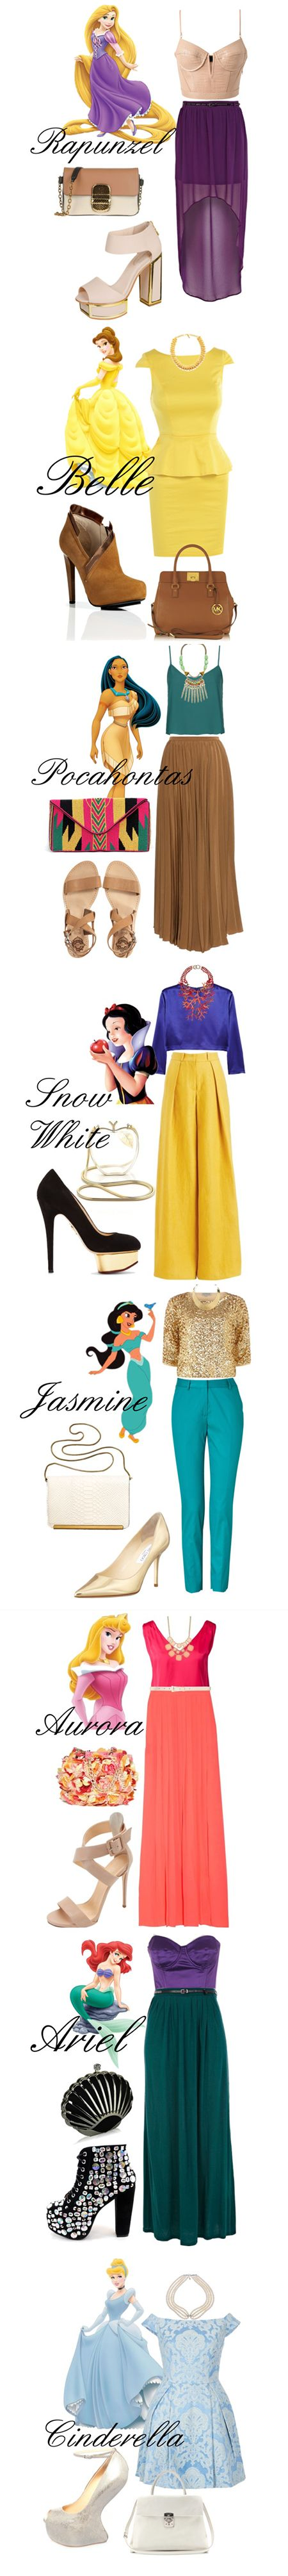 Disney Princess Inspired Outfits. I like Rapunzel Pocahontas Snow White and Ariel